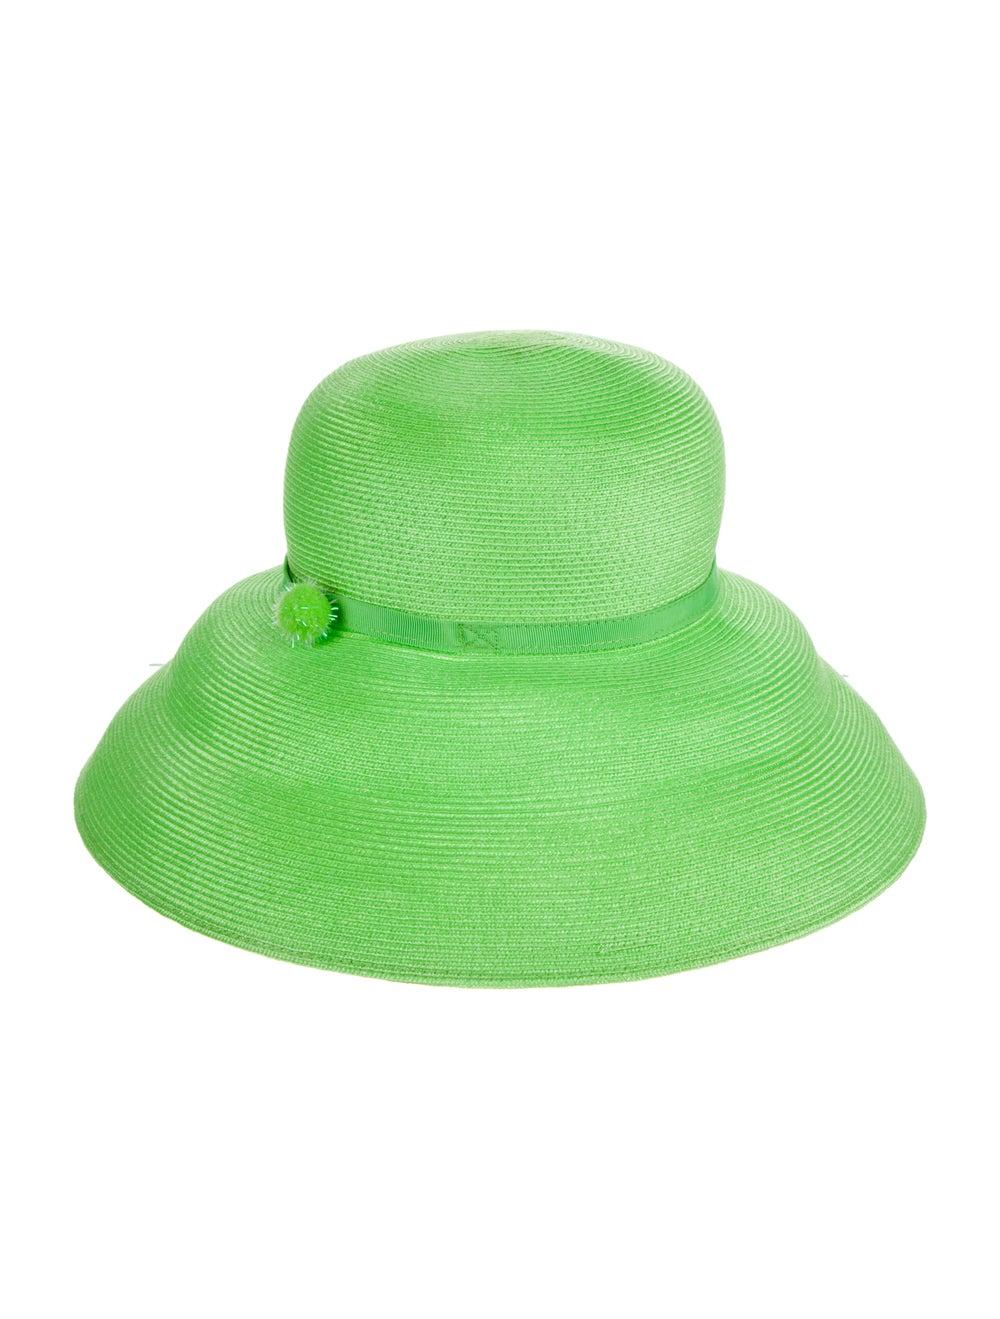 Eric Javits Eric Javits Wide brim Fedora Hat Green - image 2